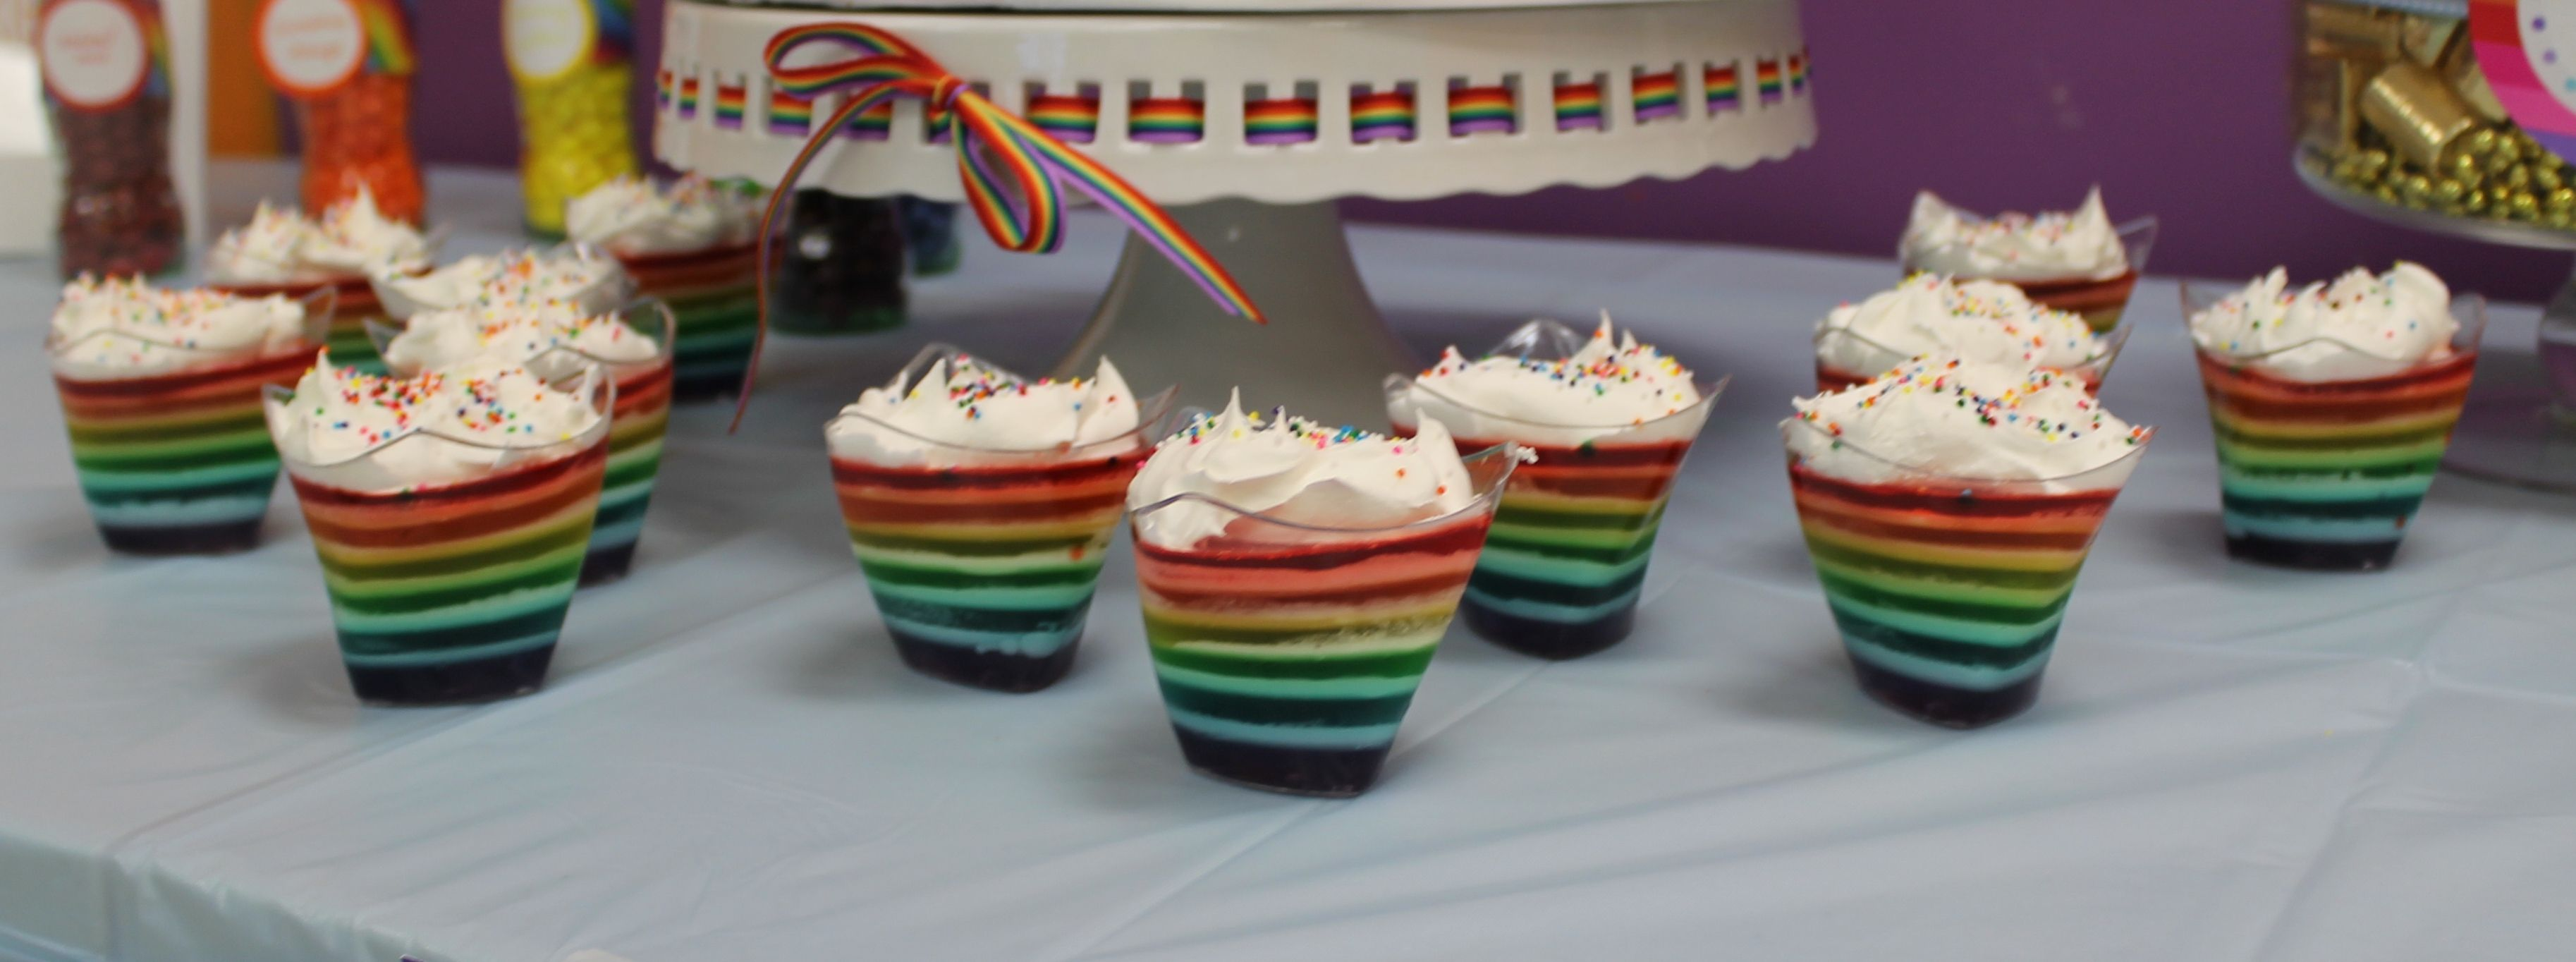 Rainbow gelatine